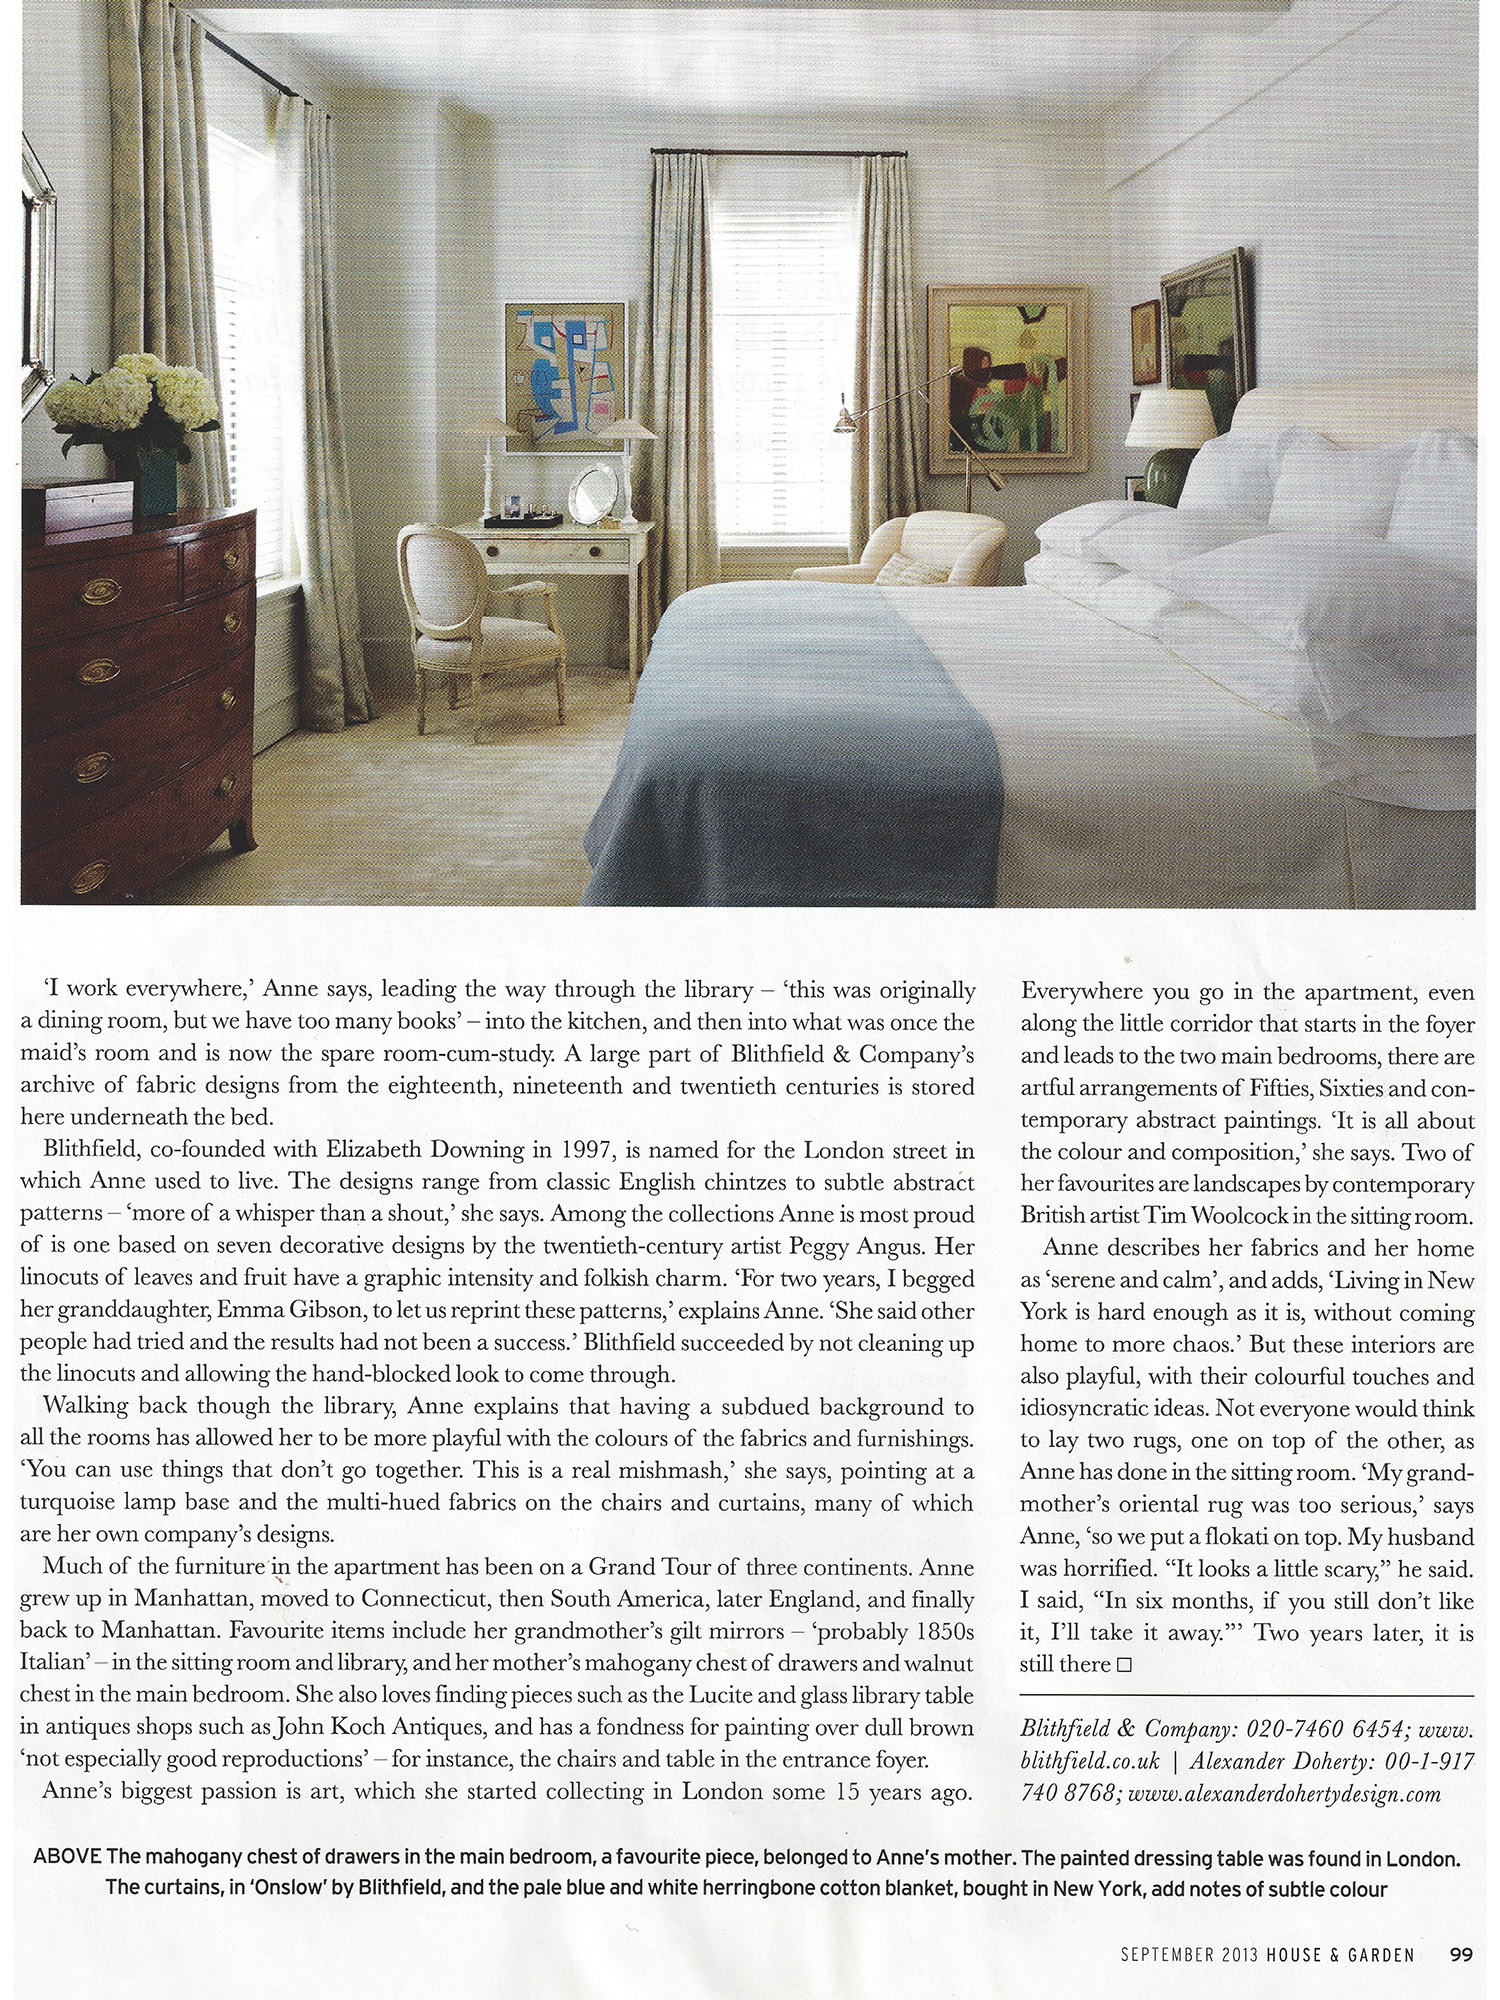 2013 September-House & Garden Page 4 of 4.jpeg